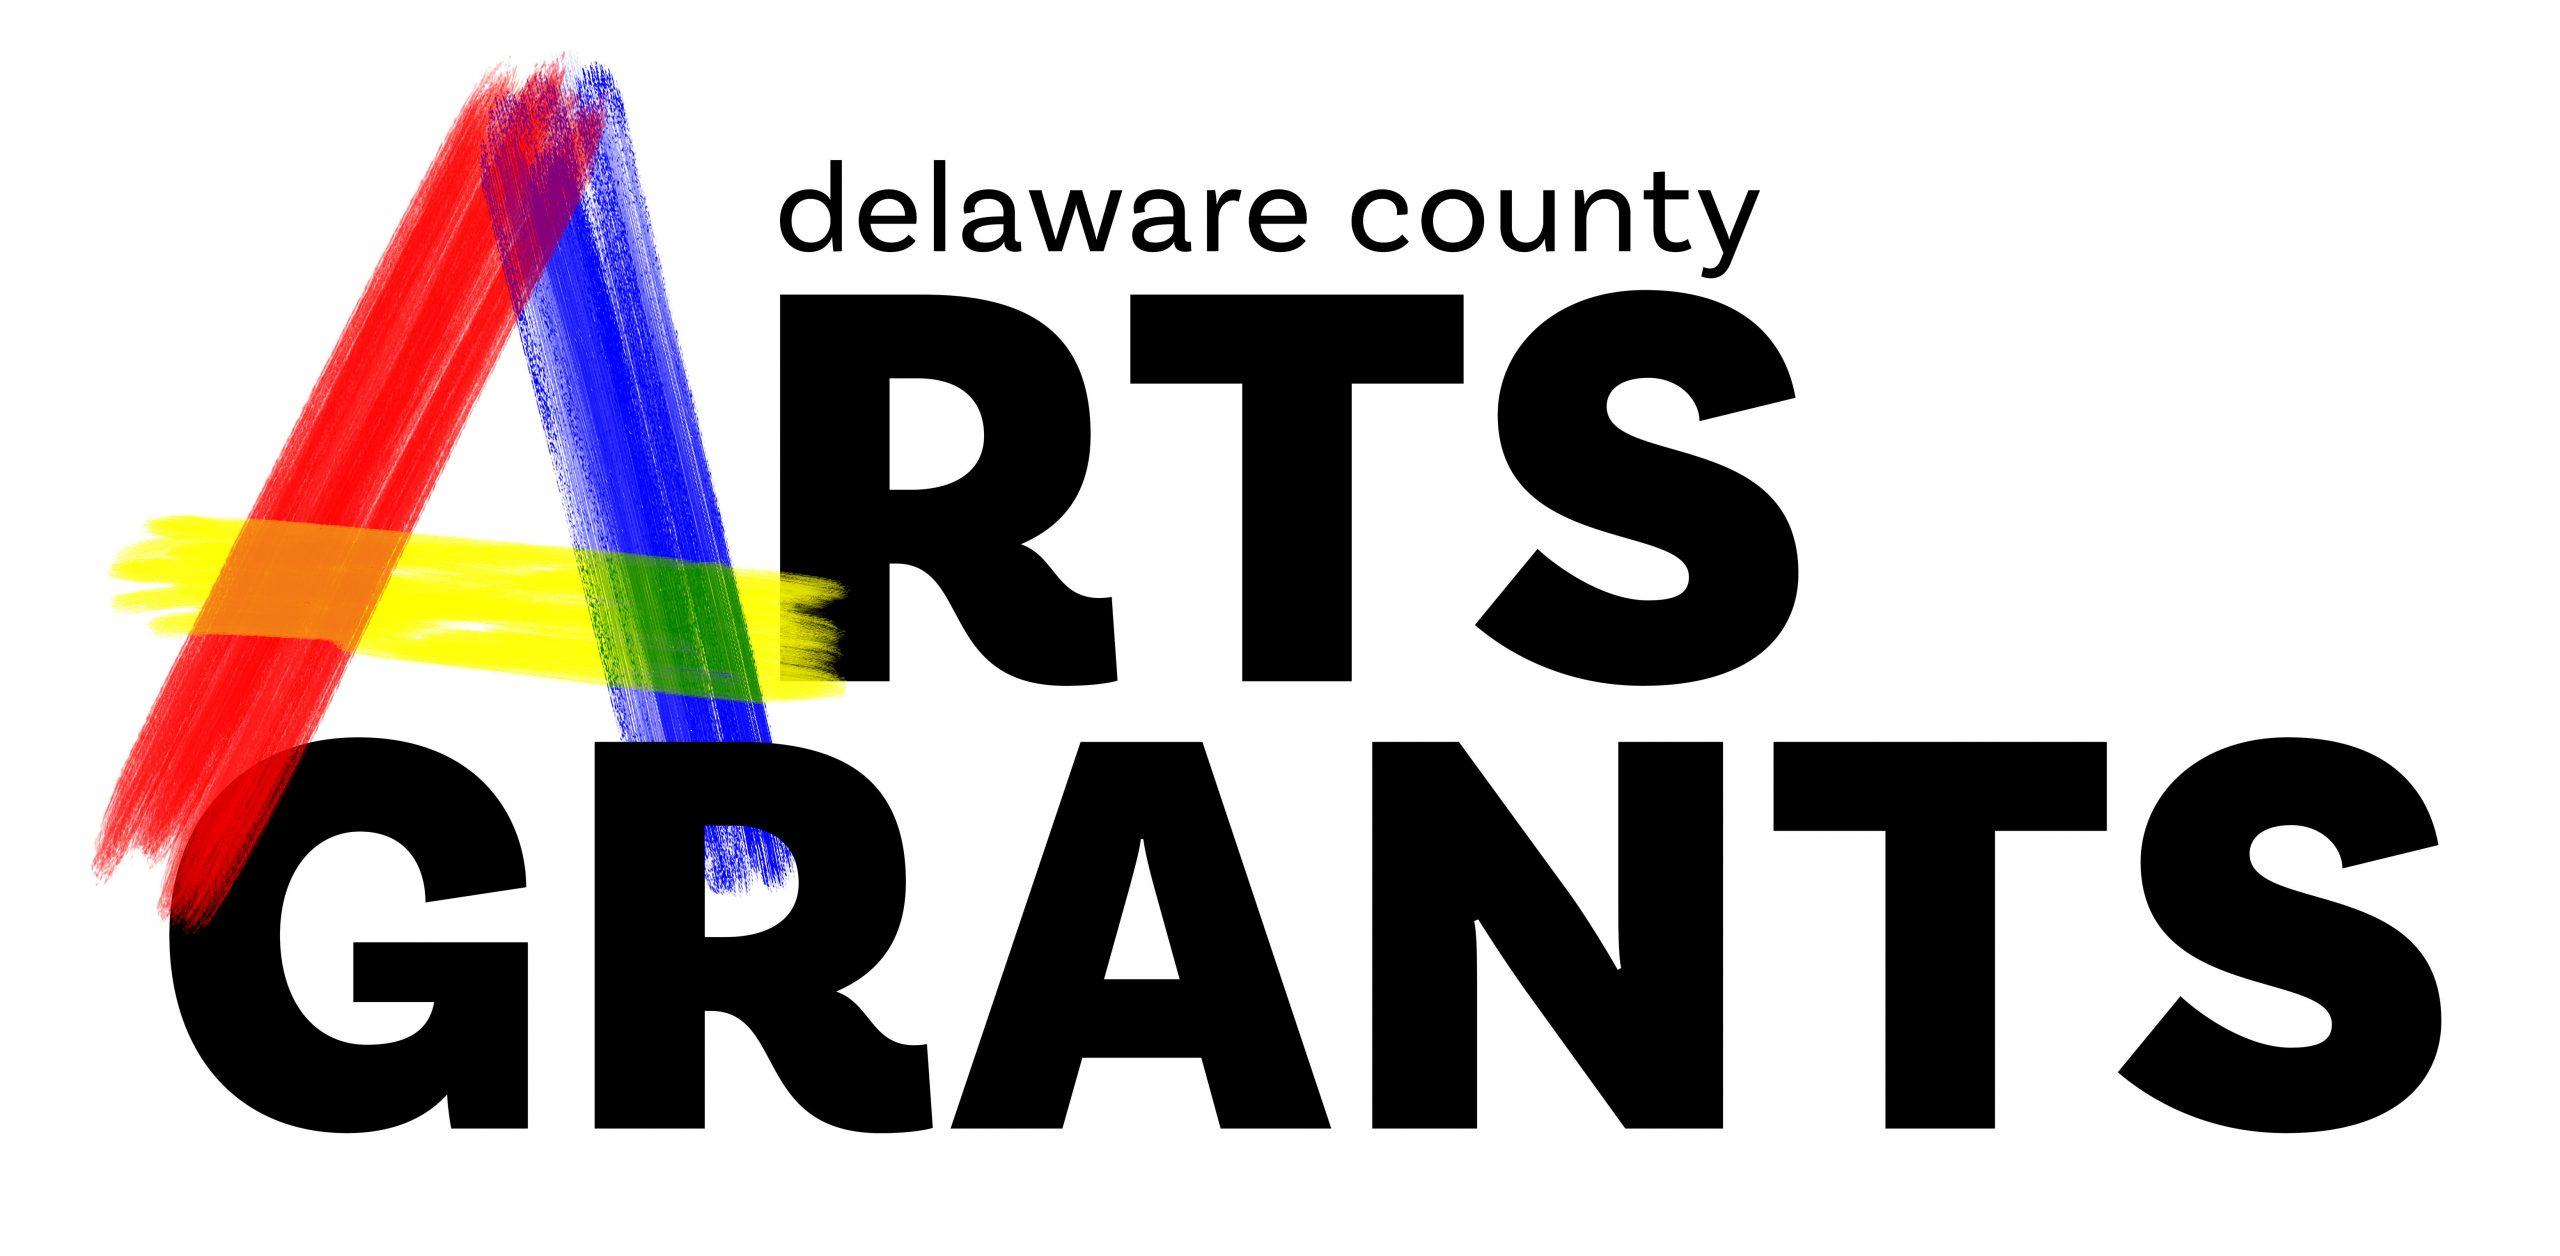 https://roxburyartsgroup.org/wp-content/uploads/2020/09/DCAG_logo_main_RGB300-scaled.jpg